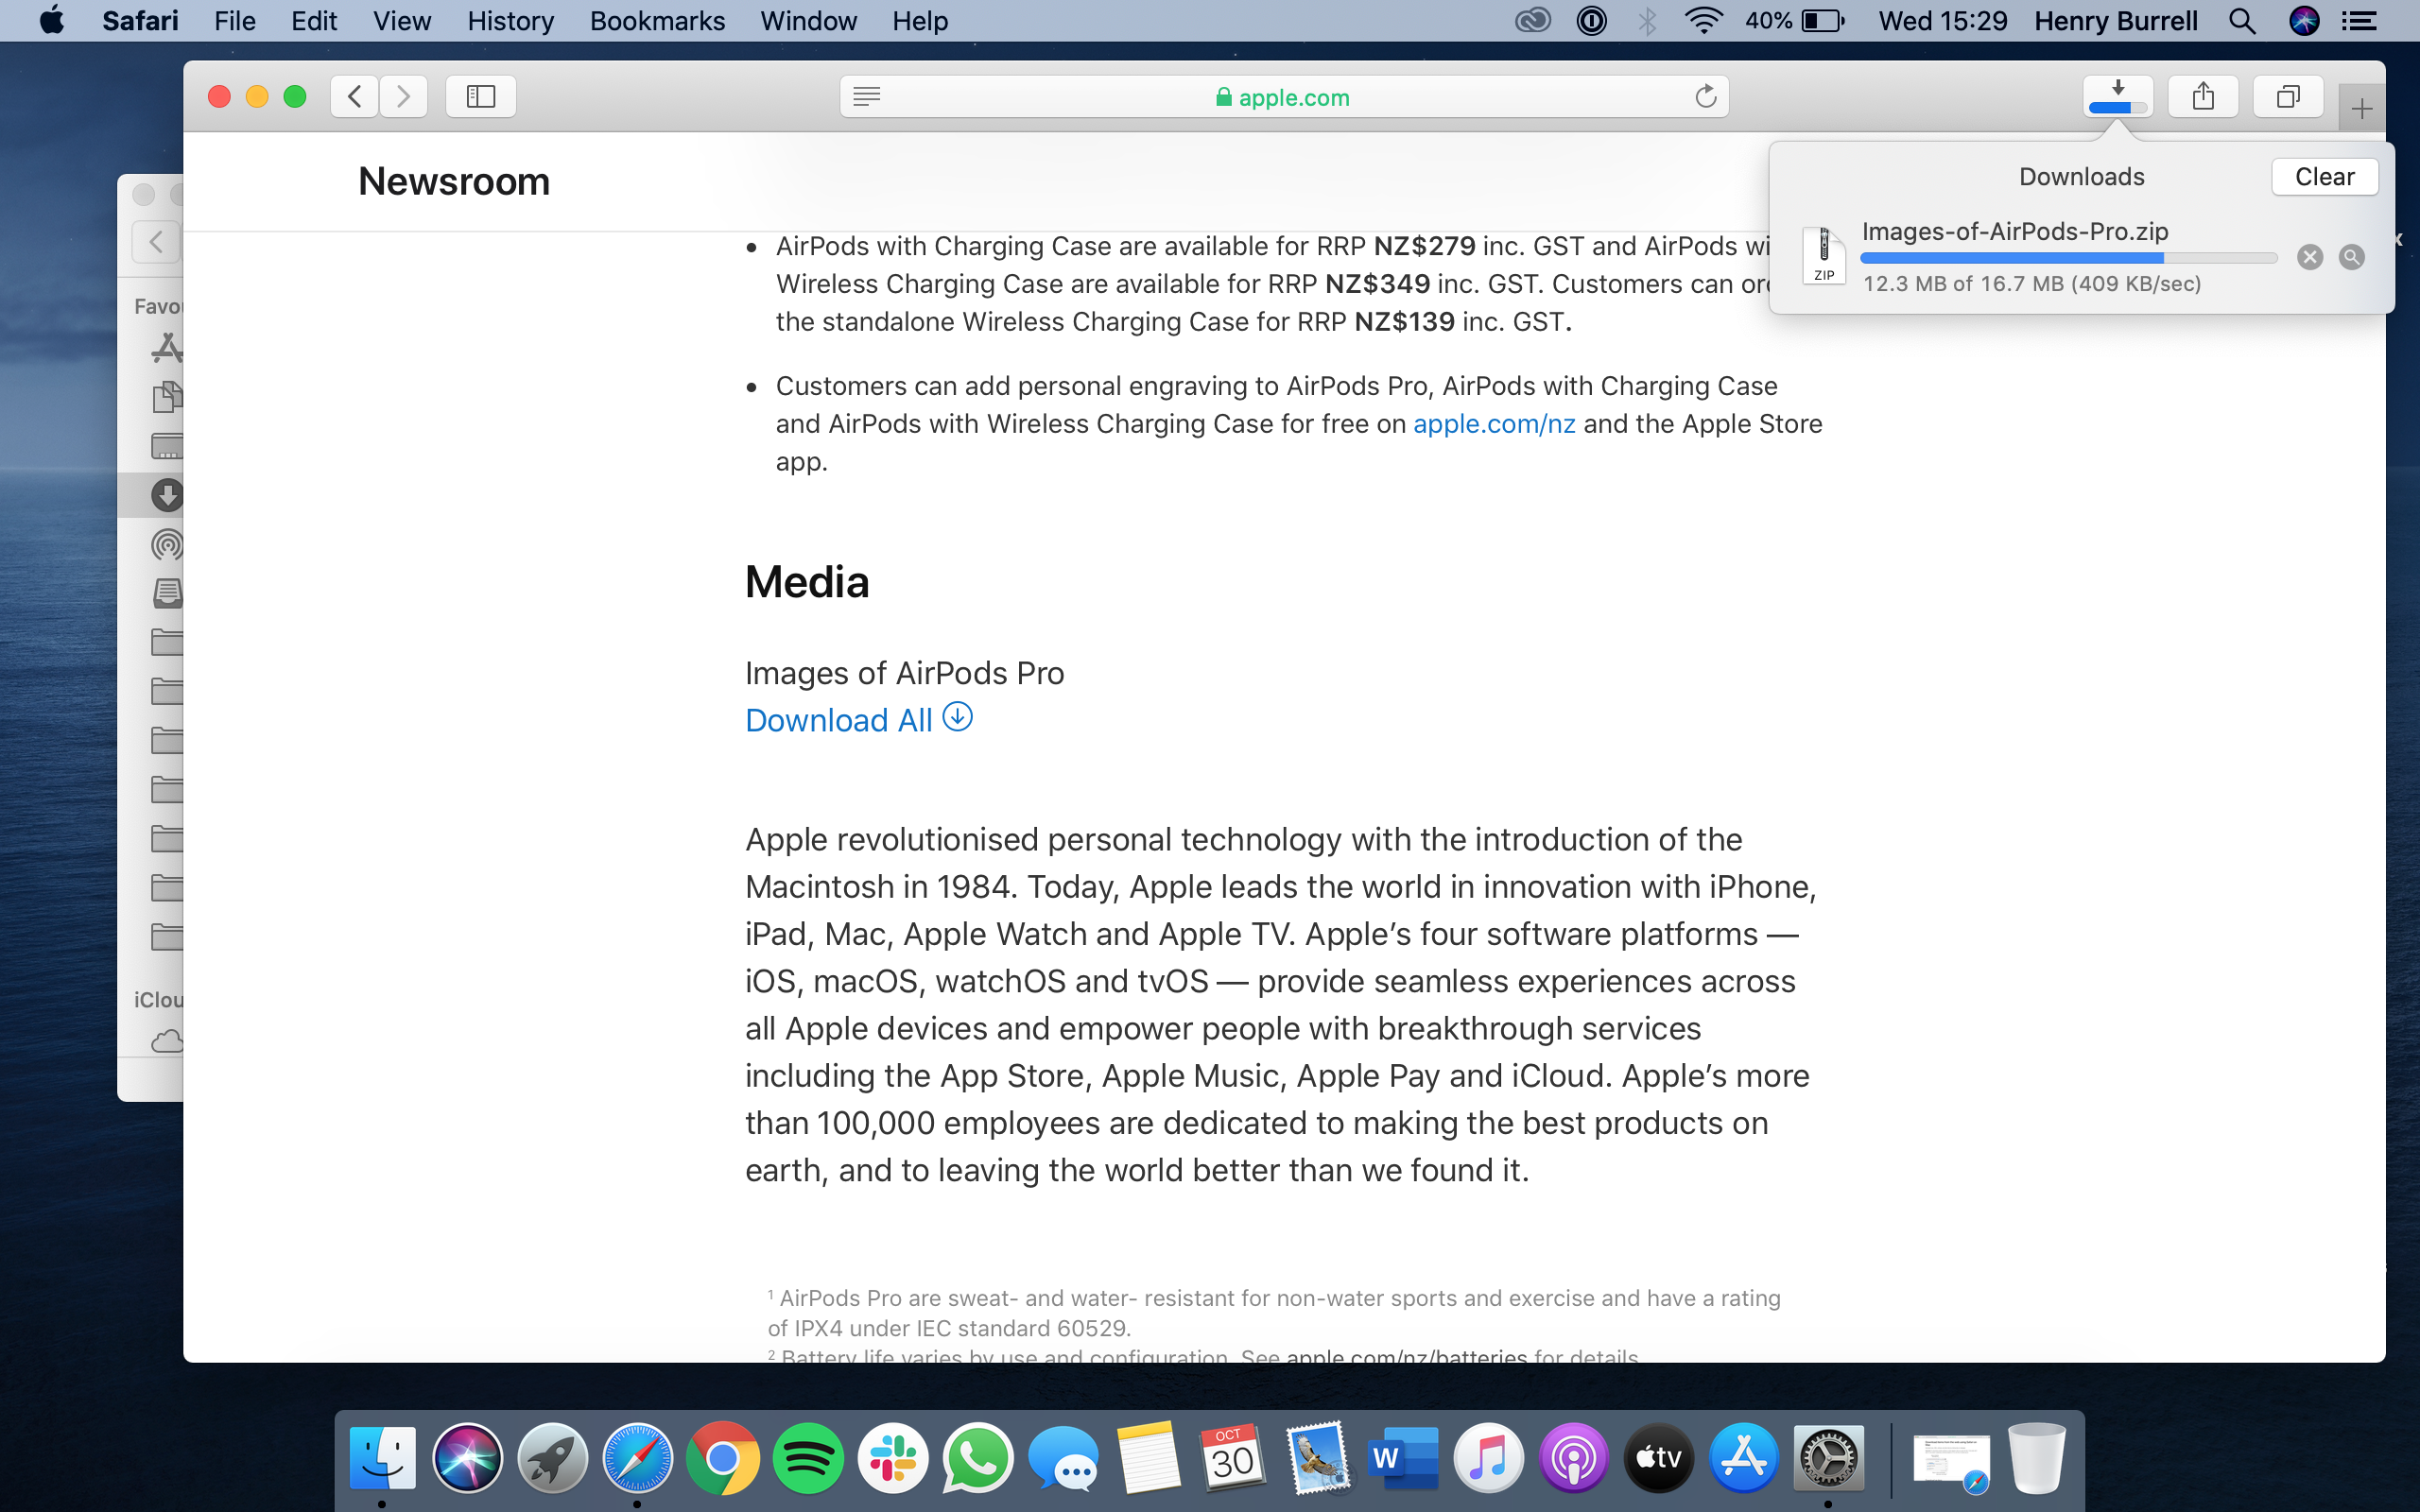 Download status on Safari on Mac